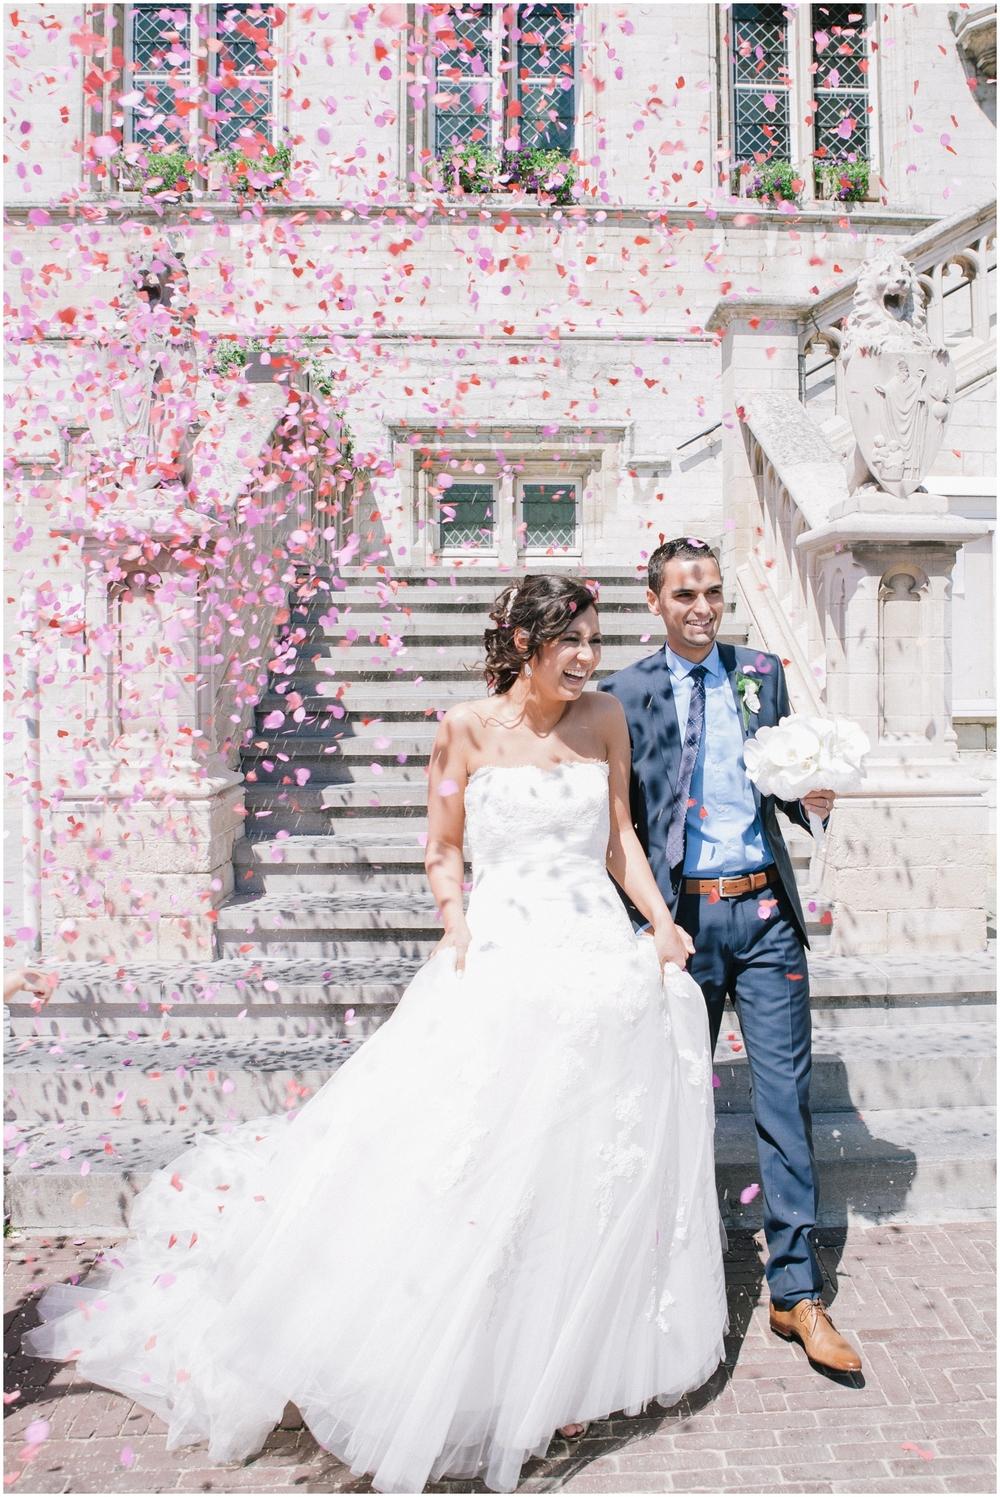 City hall Sint-Niklaas wedding